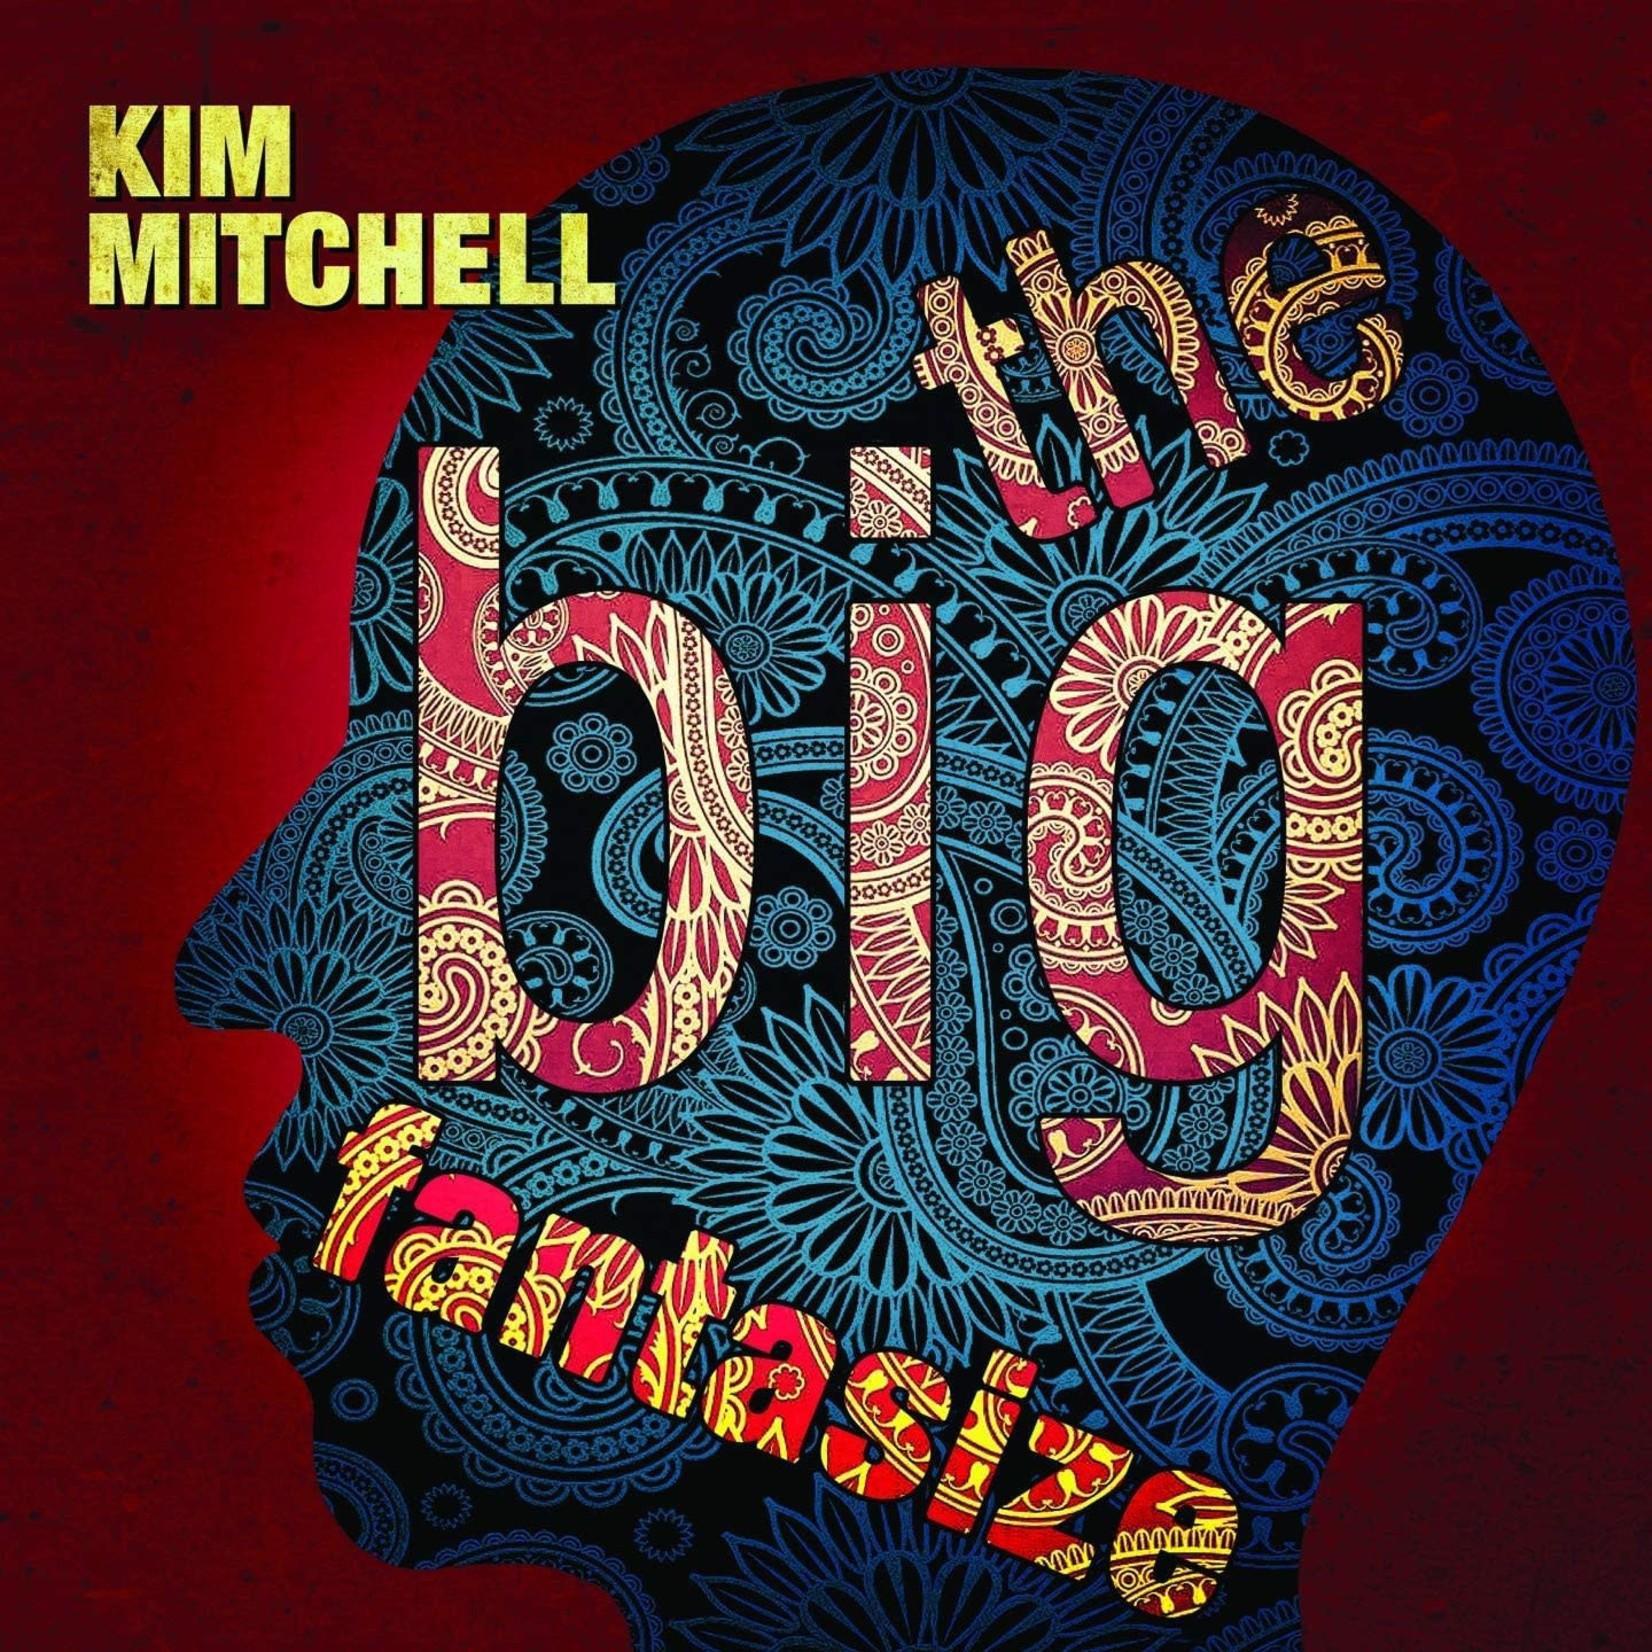 KIM MITCHELL BIG FANTASIZE (LP)